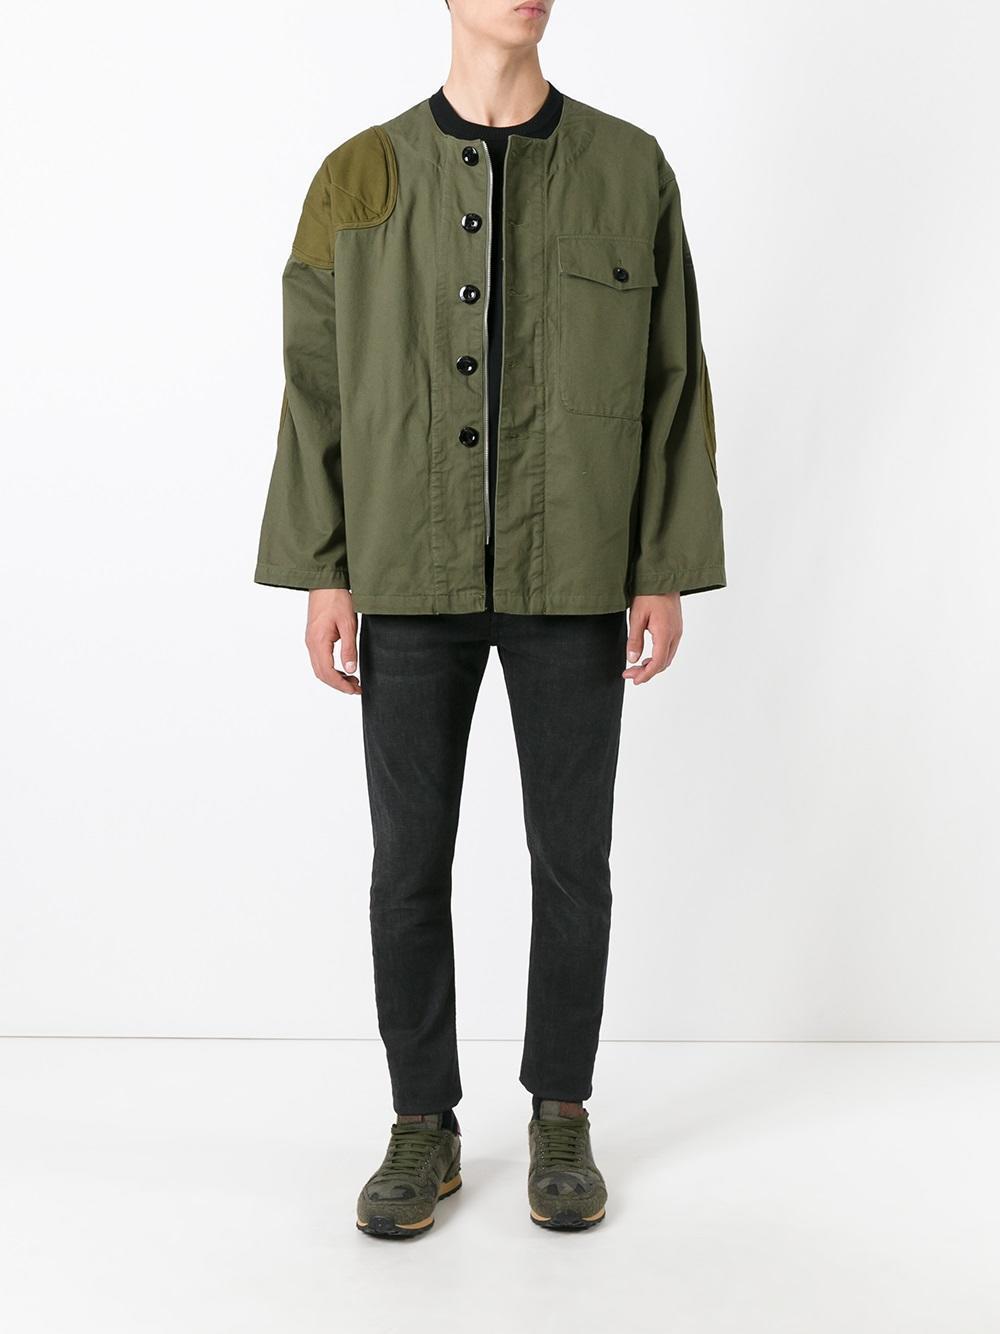 g star raw aefon jacket in green for men lyst. Black Bedroom Furniture Sets. Home Design Ideas